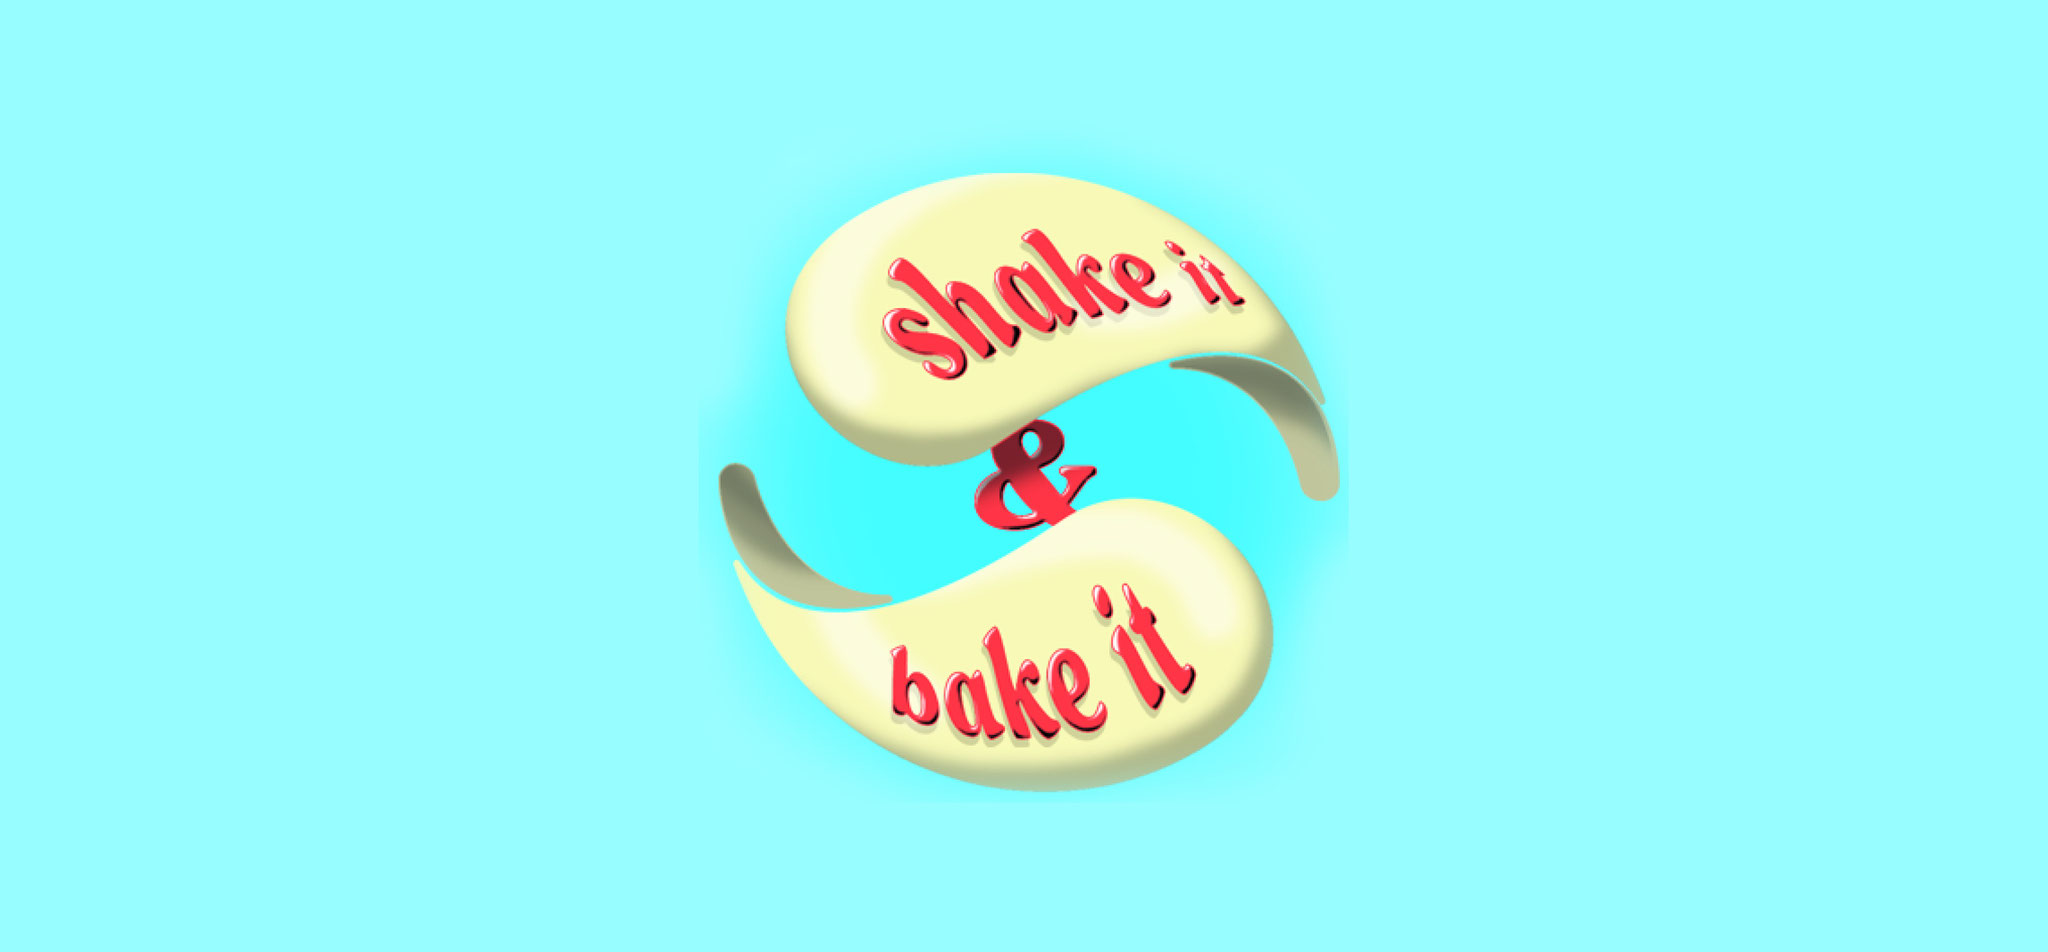 FLECHTORFER MÜHLE | logo shake it & bake it – infragrau, gute gestaltung